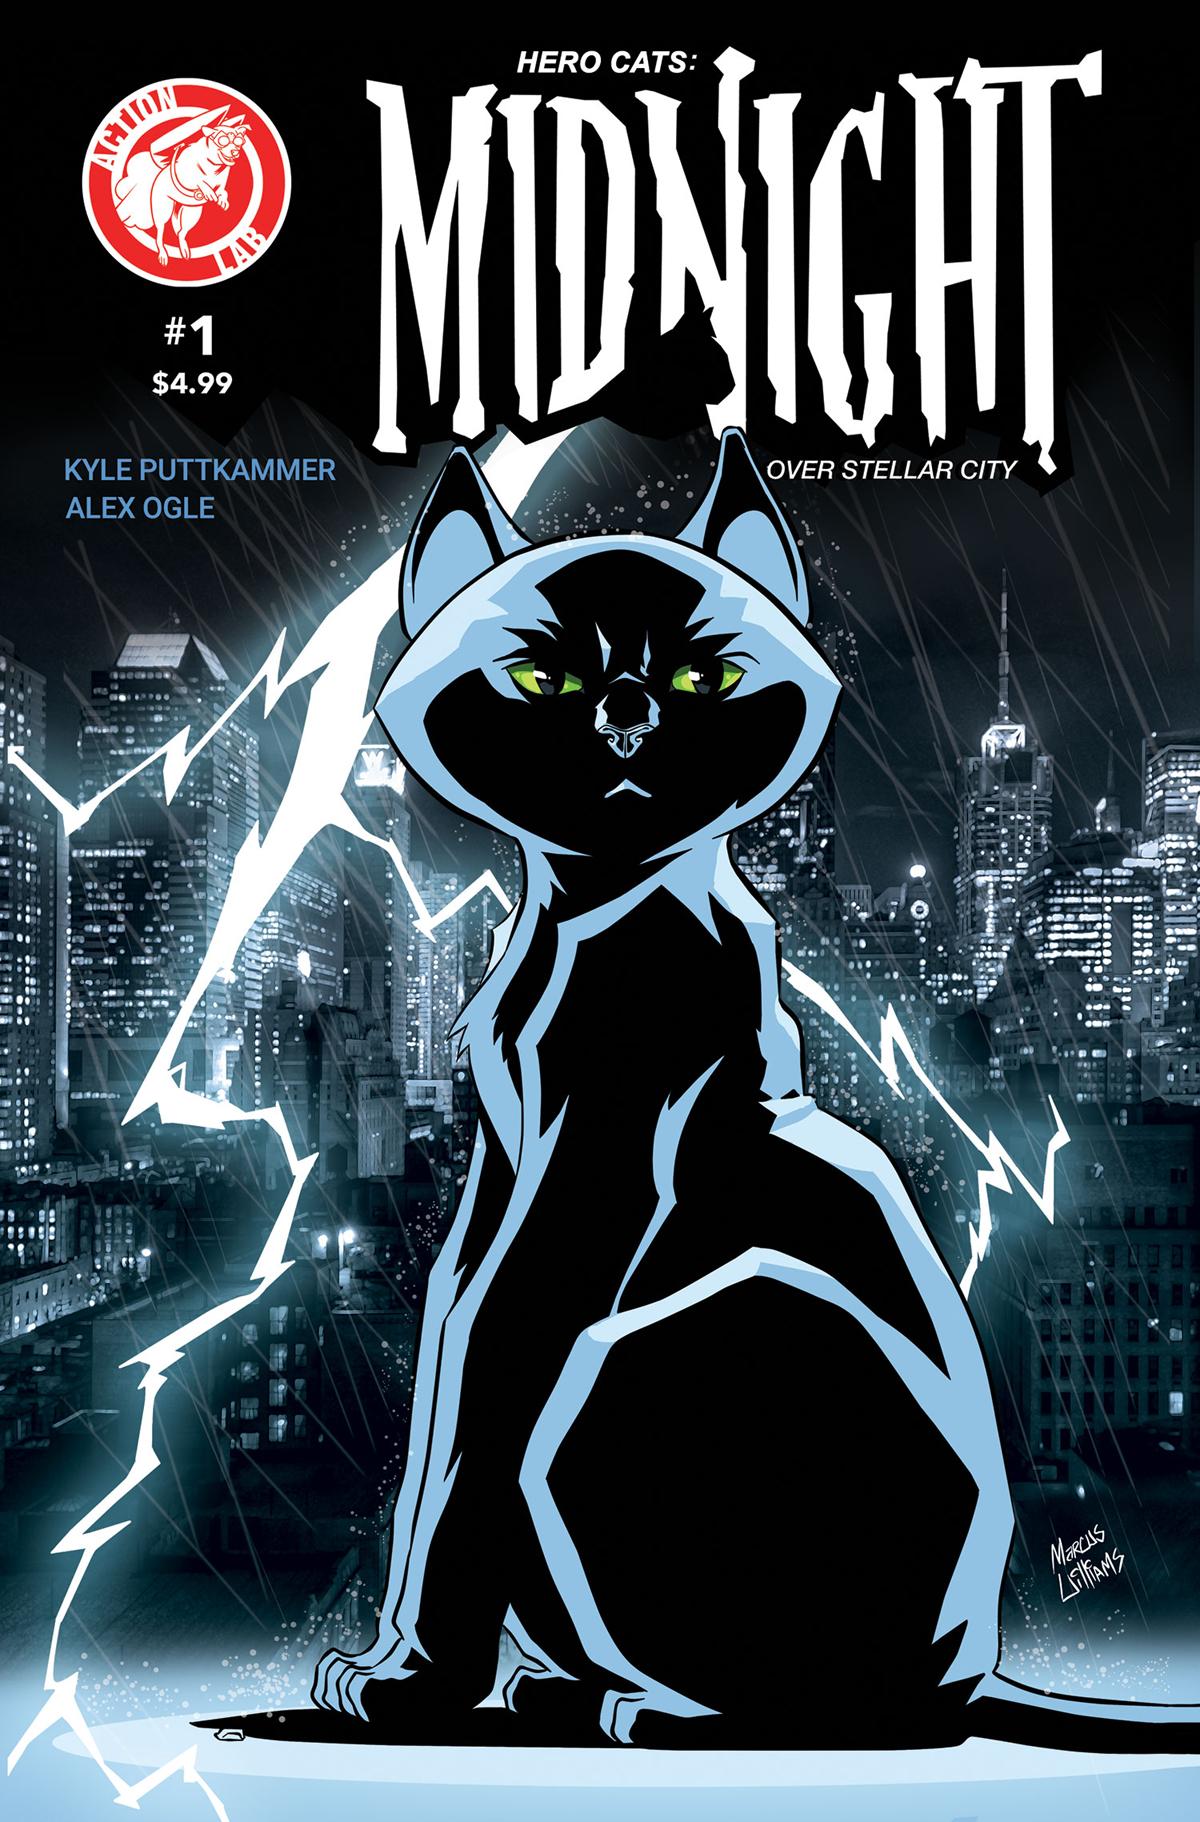 HERO CATS: Midnight over Stellar City featuring art by Alex Ogle.